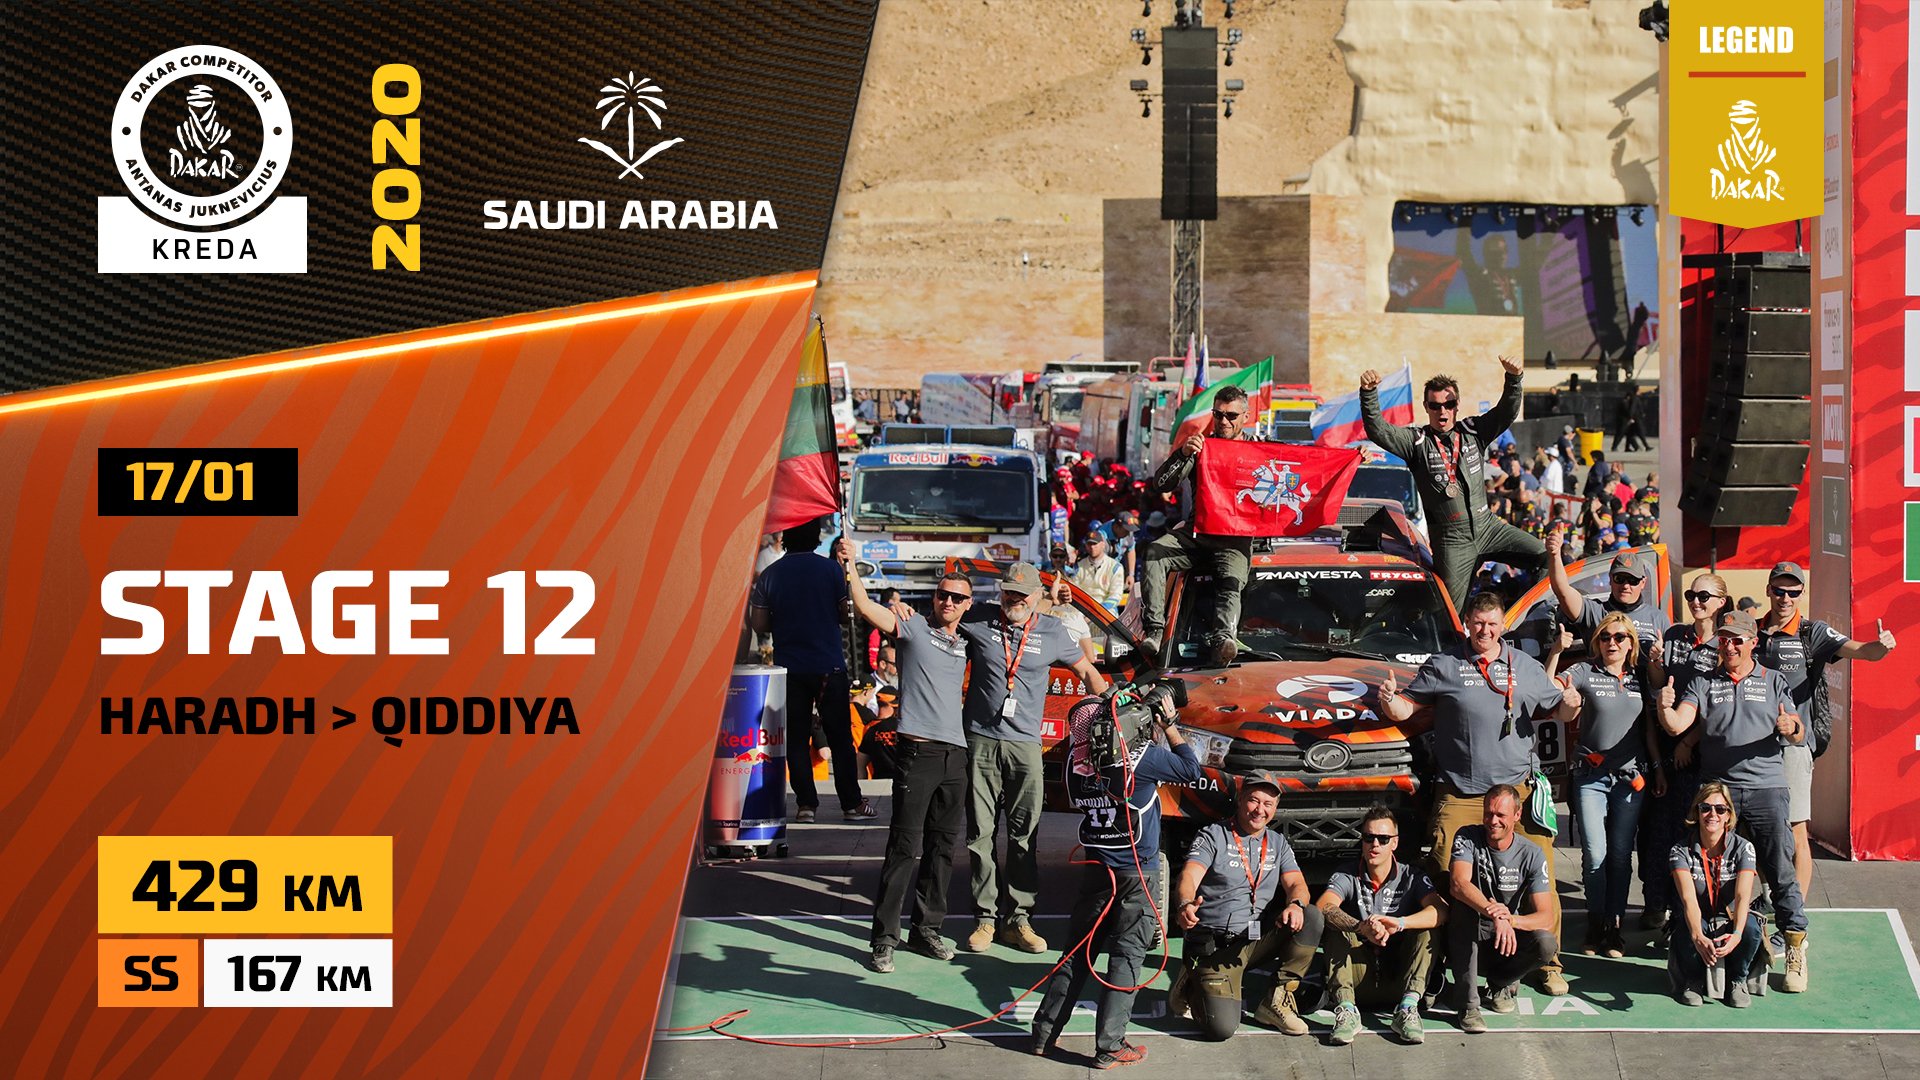 Dakar Rally 2020. Stage 12 Highlights Haradh – Qiddiya and Podium in Saudi Arabia